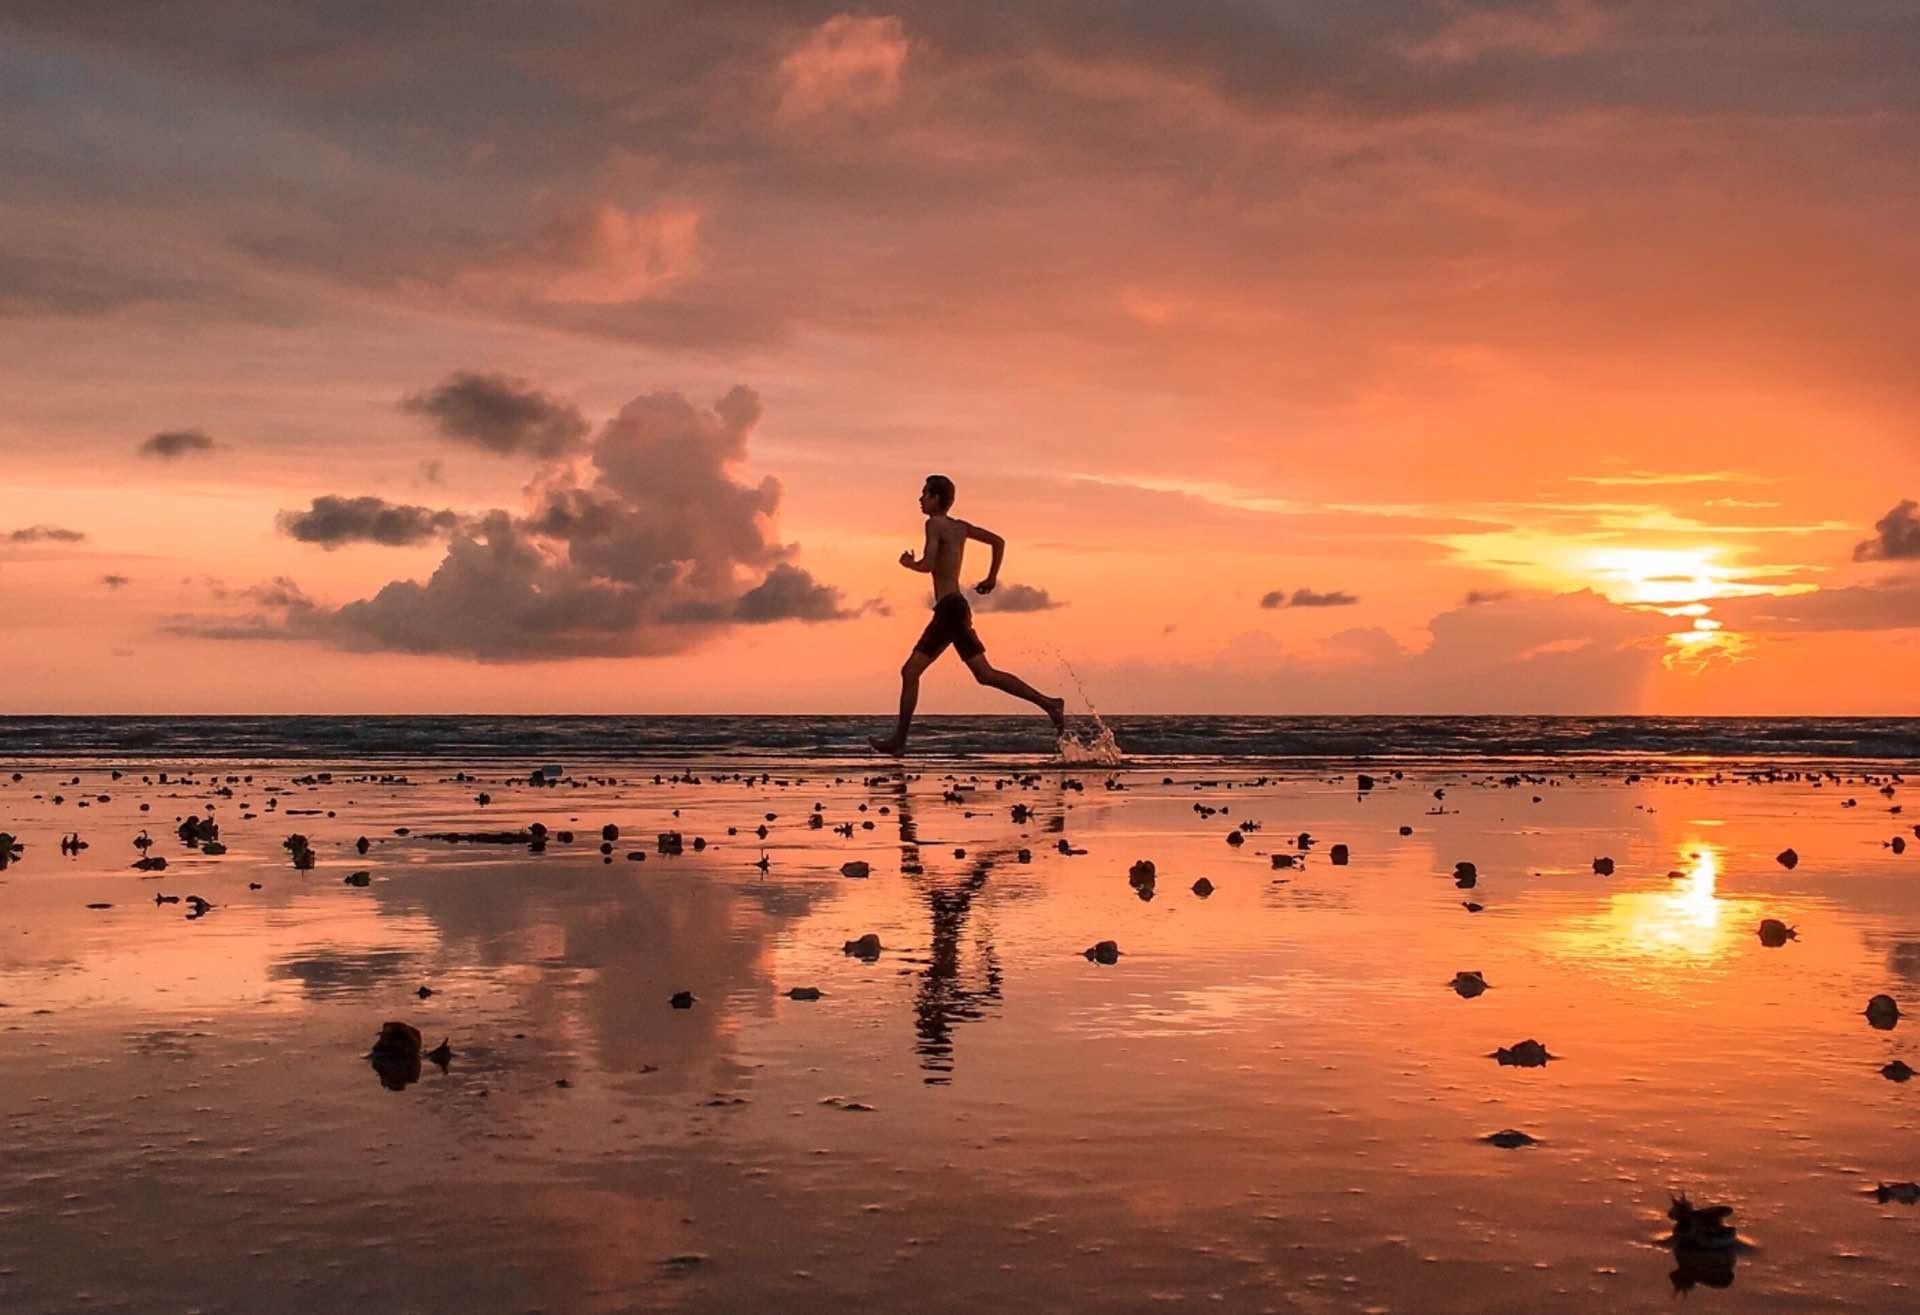 everyday-carry-morning-run-guide-hero-dev-dodia